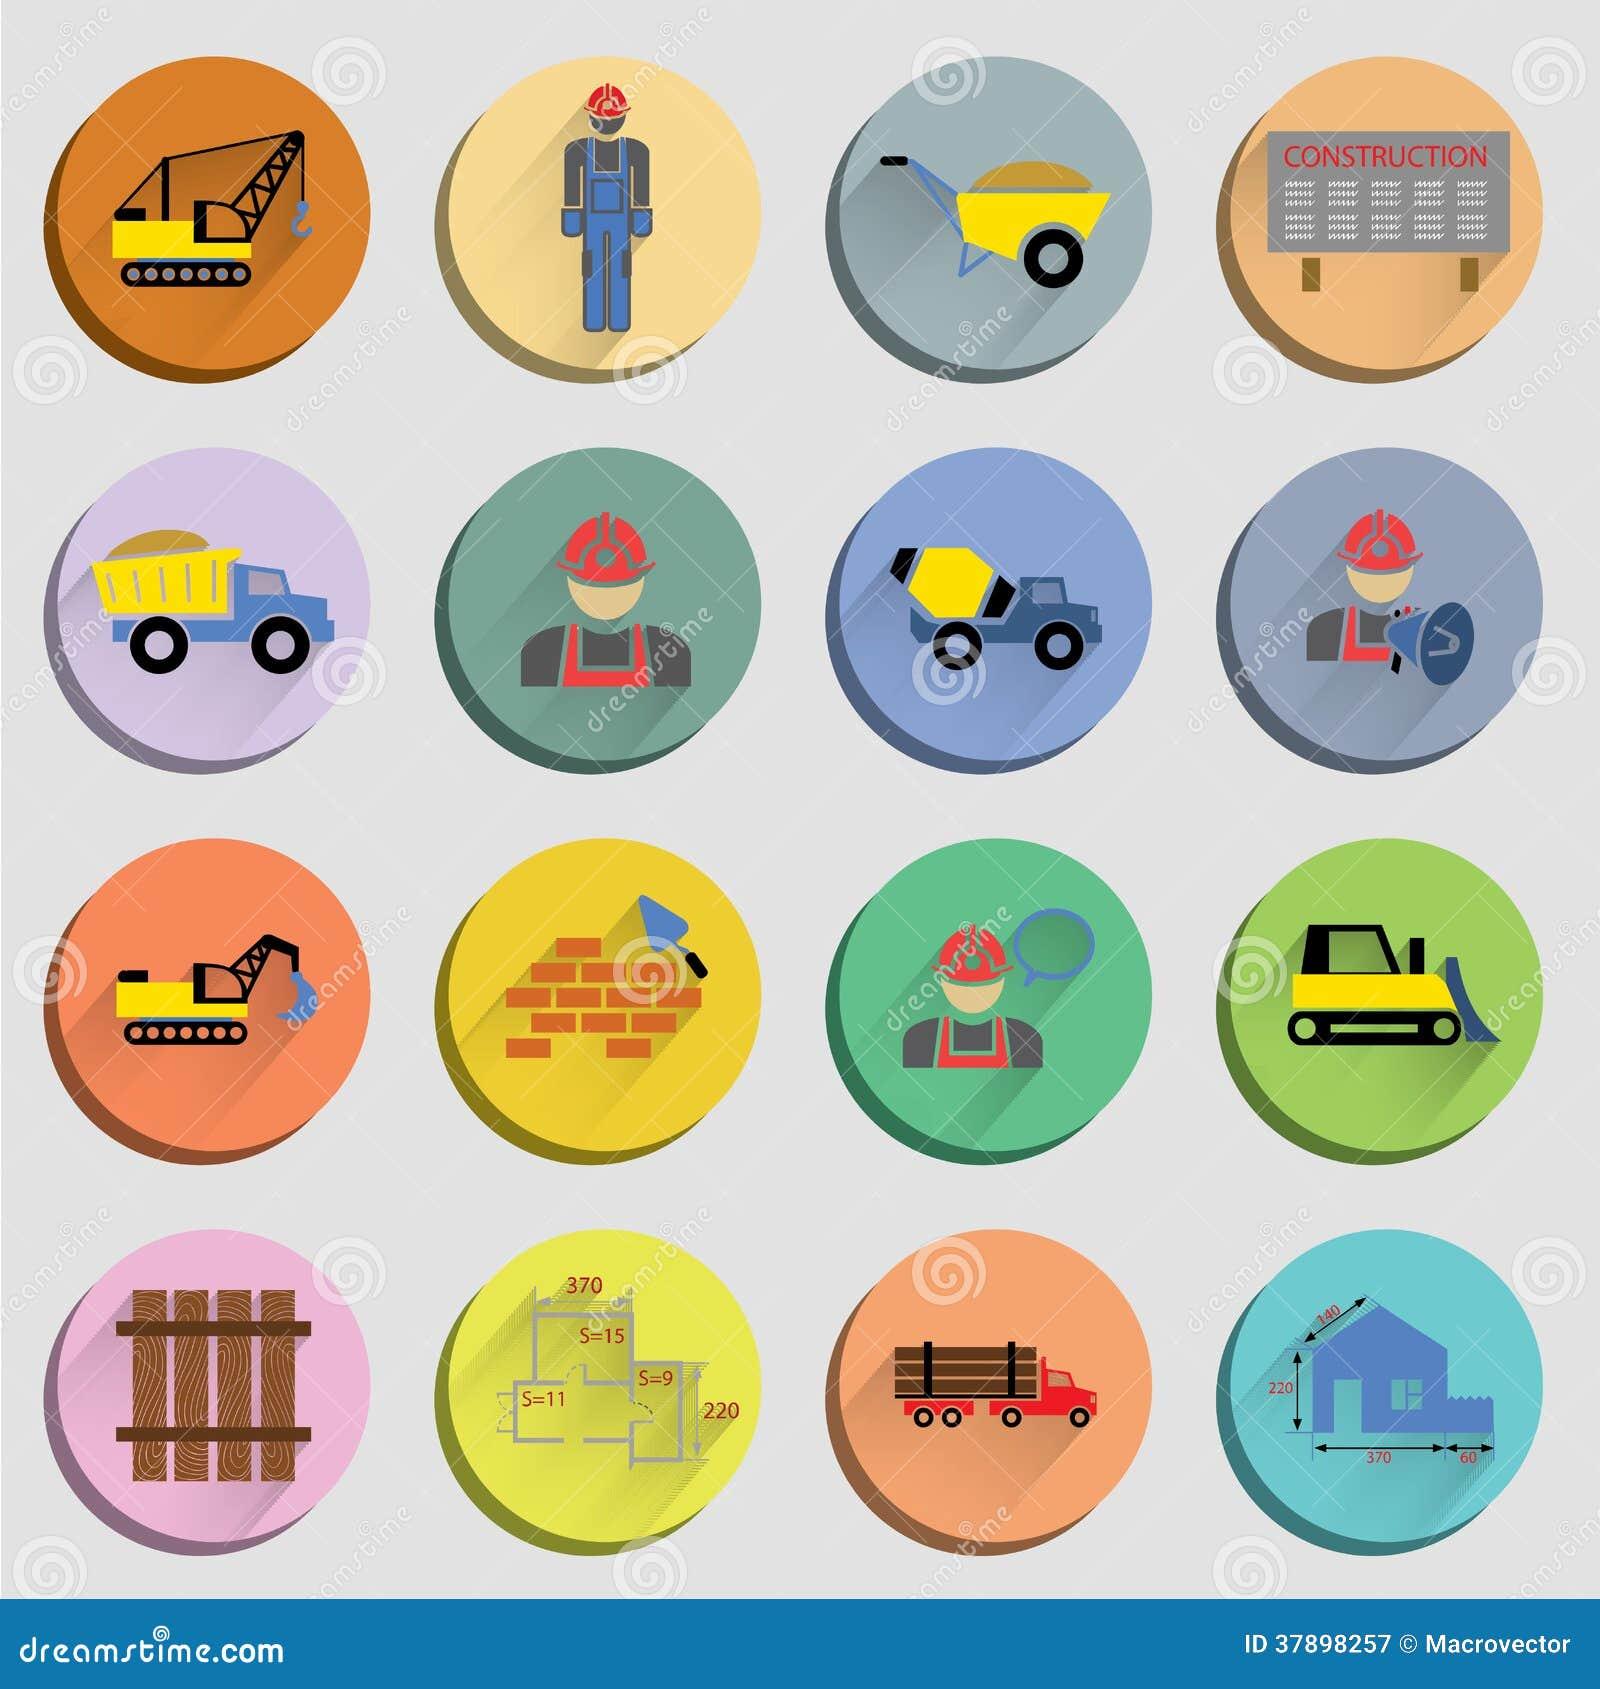 Construction Flat Icons Set Royalty Free Stock Photography - Image ...